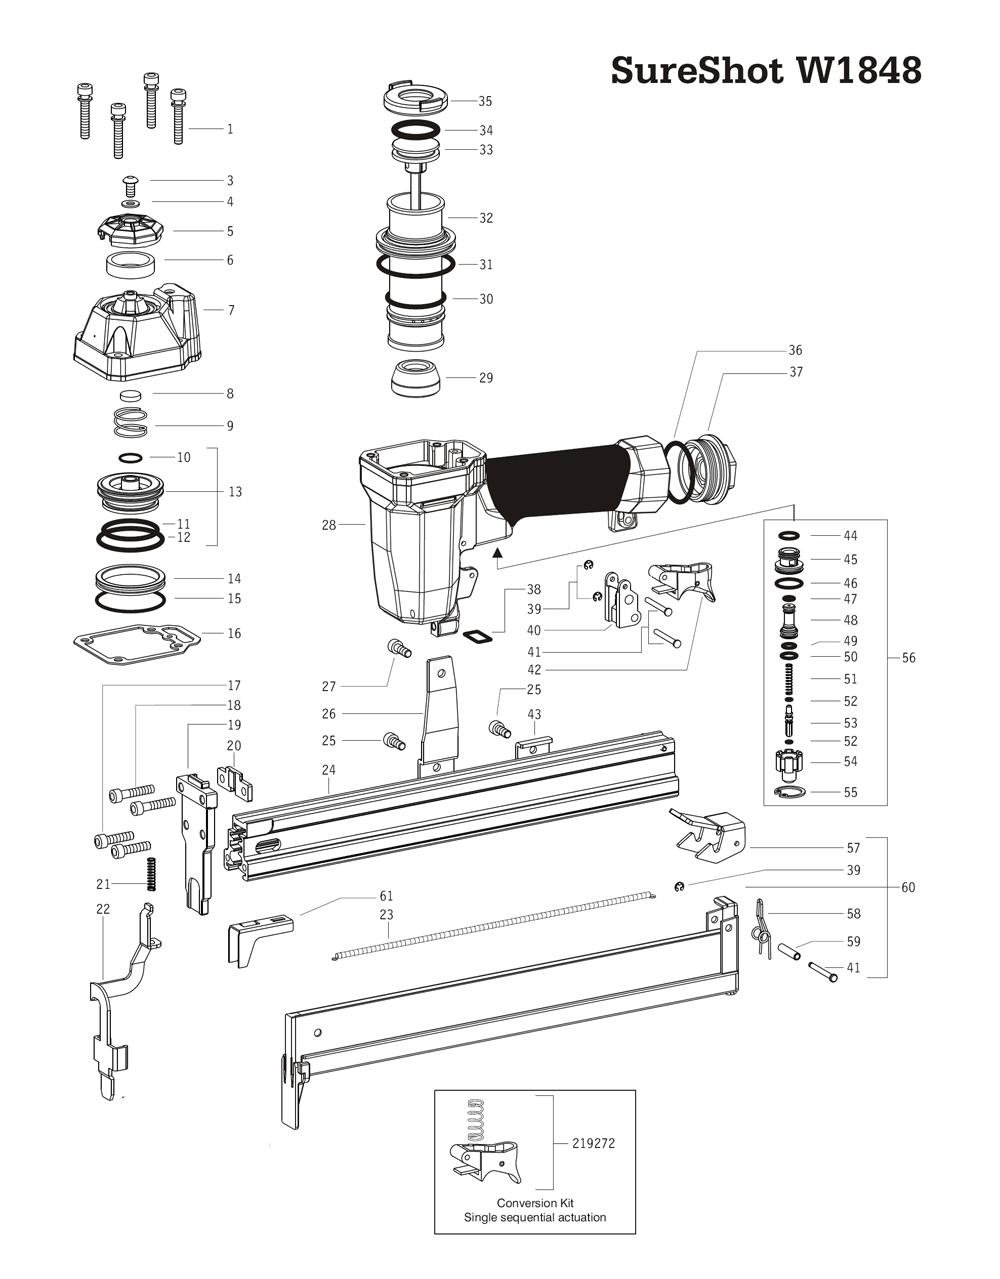 Duo-Fast SureShot-W1848 Parts